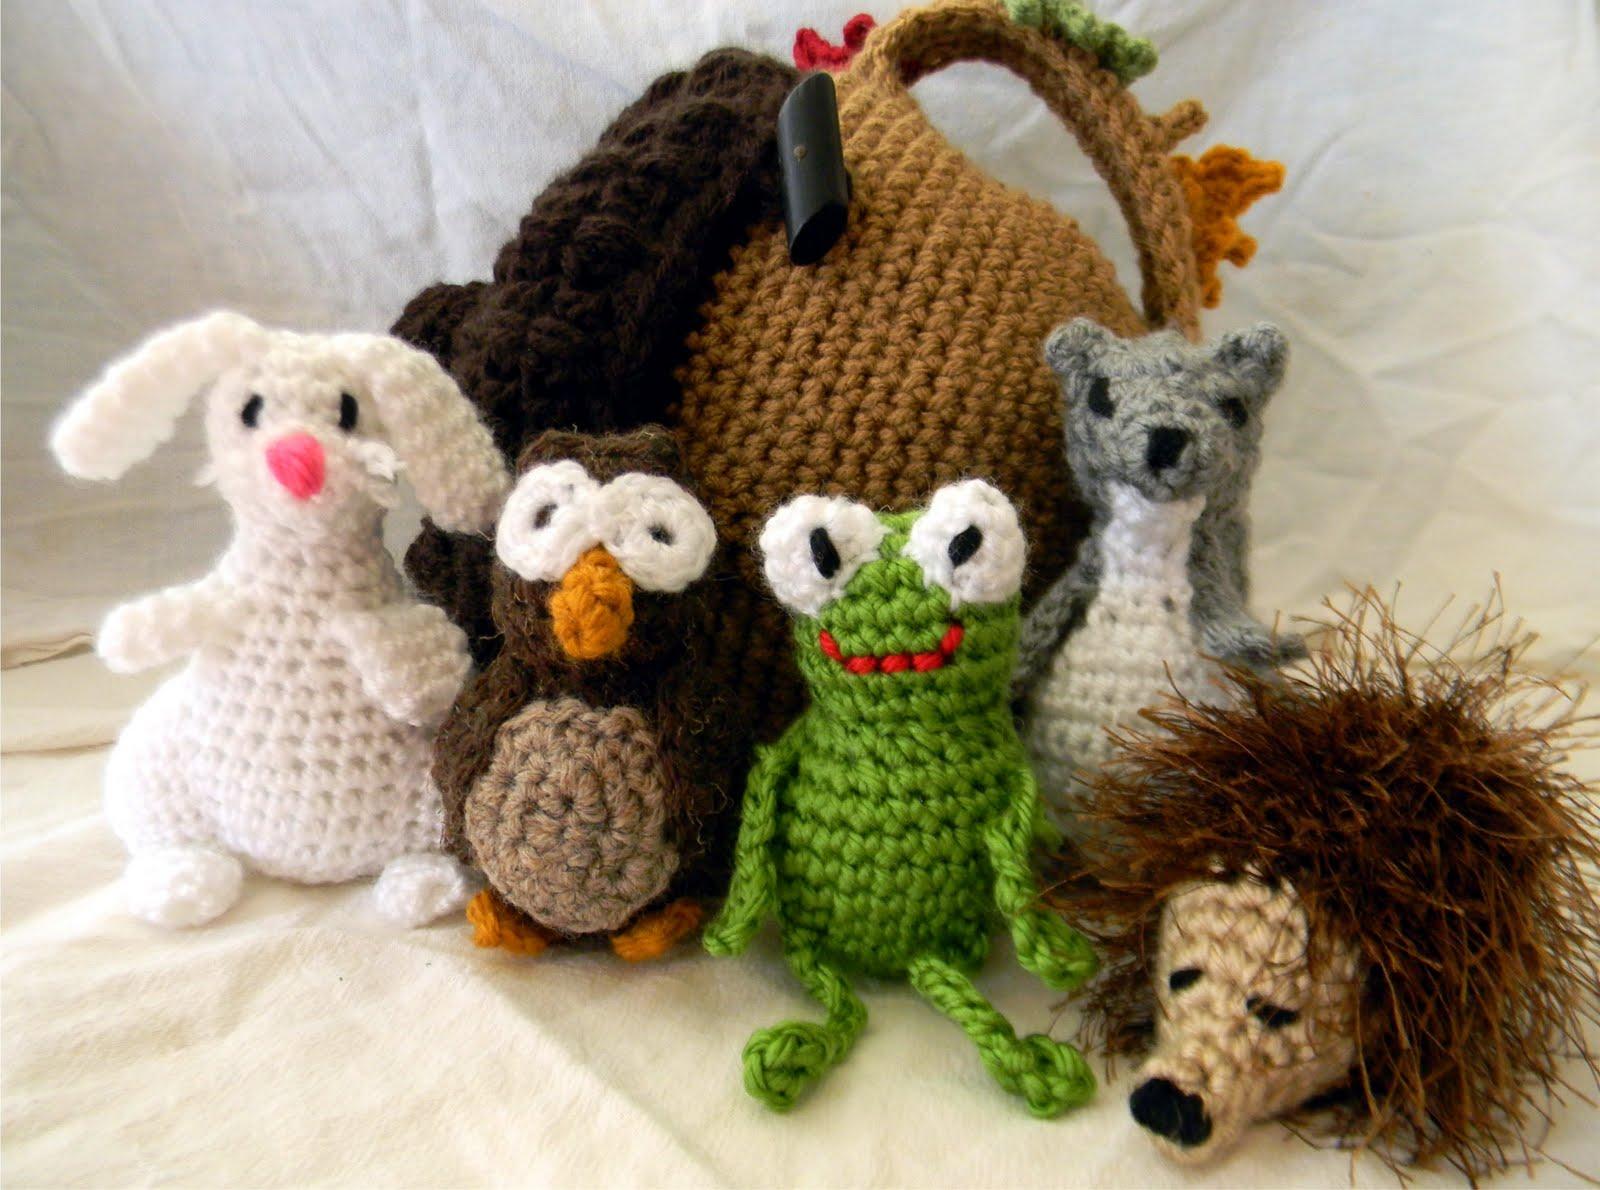 Forest Friends Amigurumi Free Crochet Patterns | Crochet patterns ... | 1190x1600